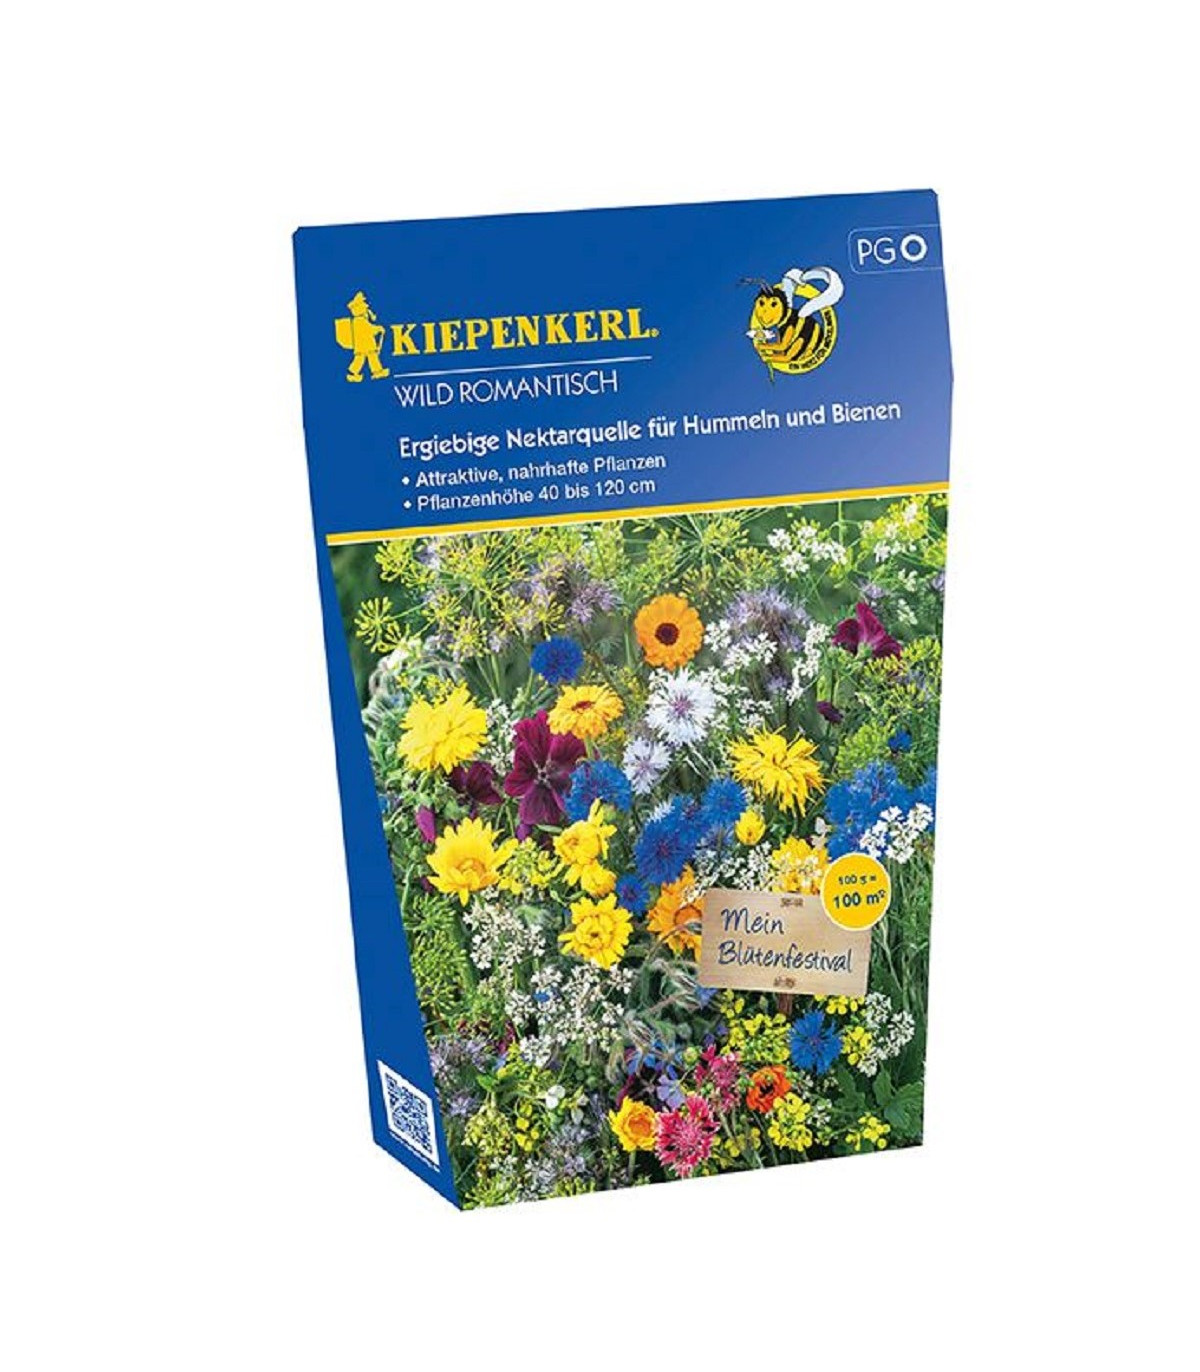 Květinová směs Wild Romantisch - semena - 100 g